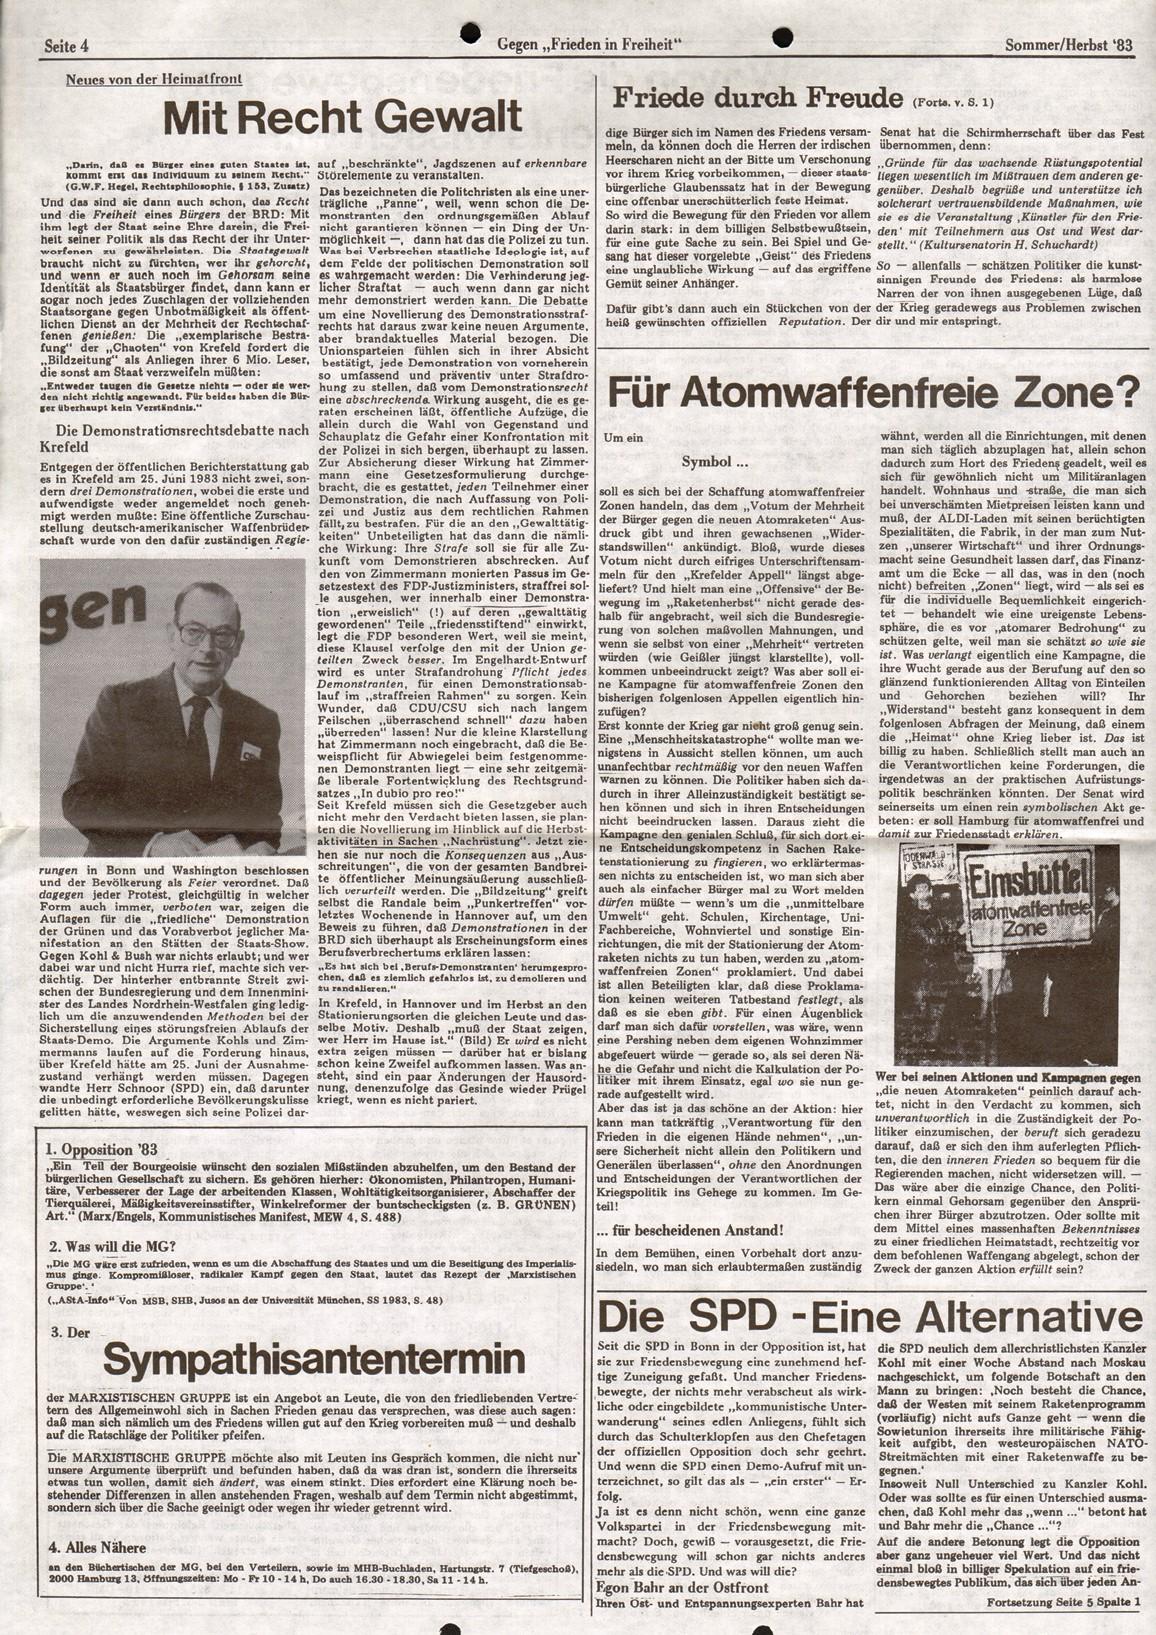 Berlin_MG_FB_19830800_04